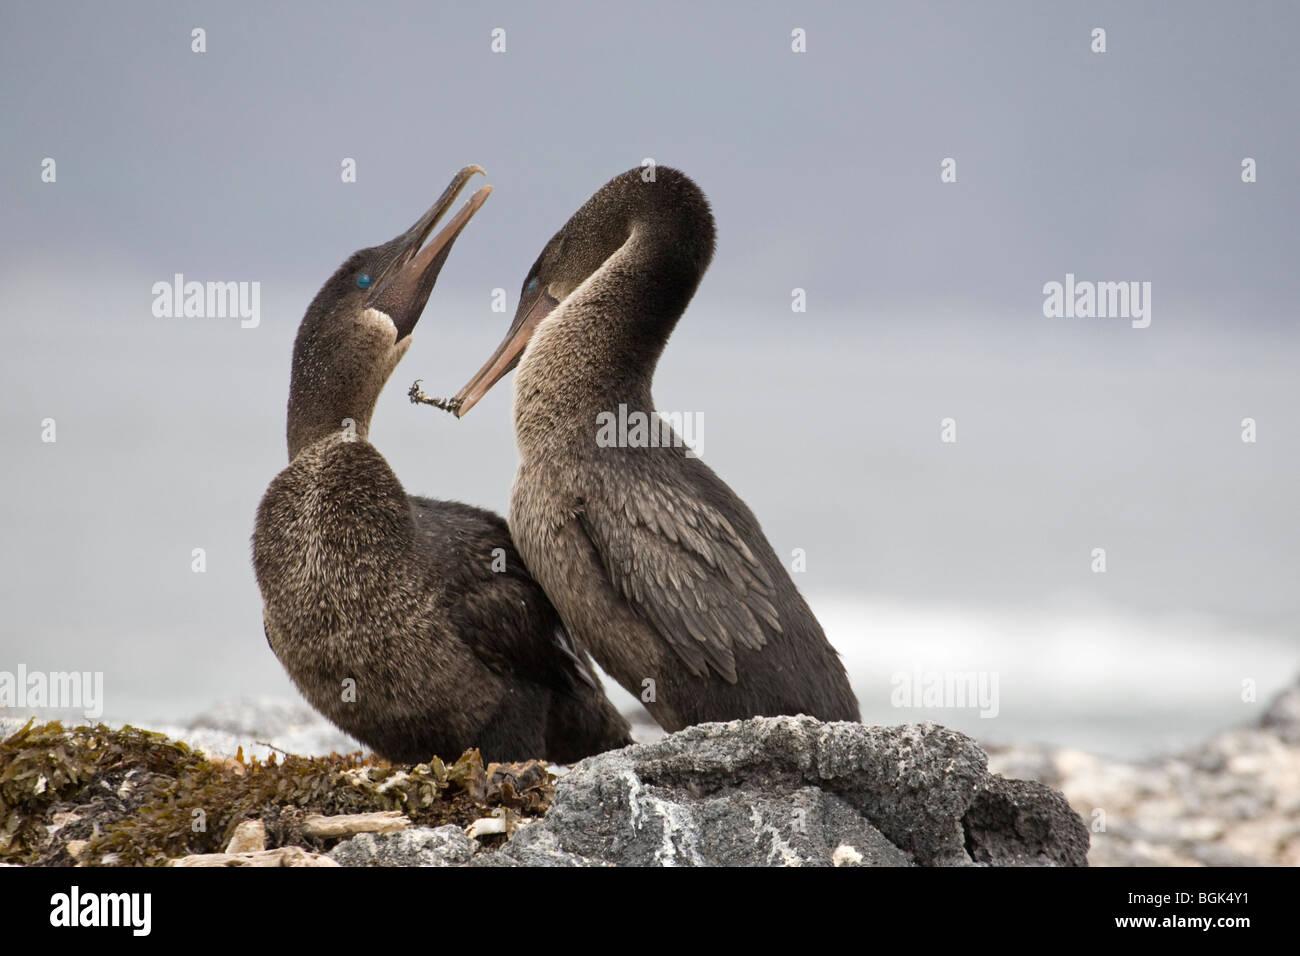 Flightless Cormorant  (Phalacrocorax harrisi) male presenting gift of seaweed nesting material to female during - Stock Image